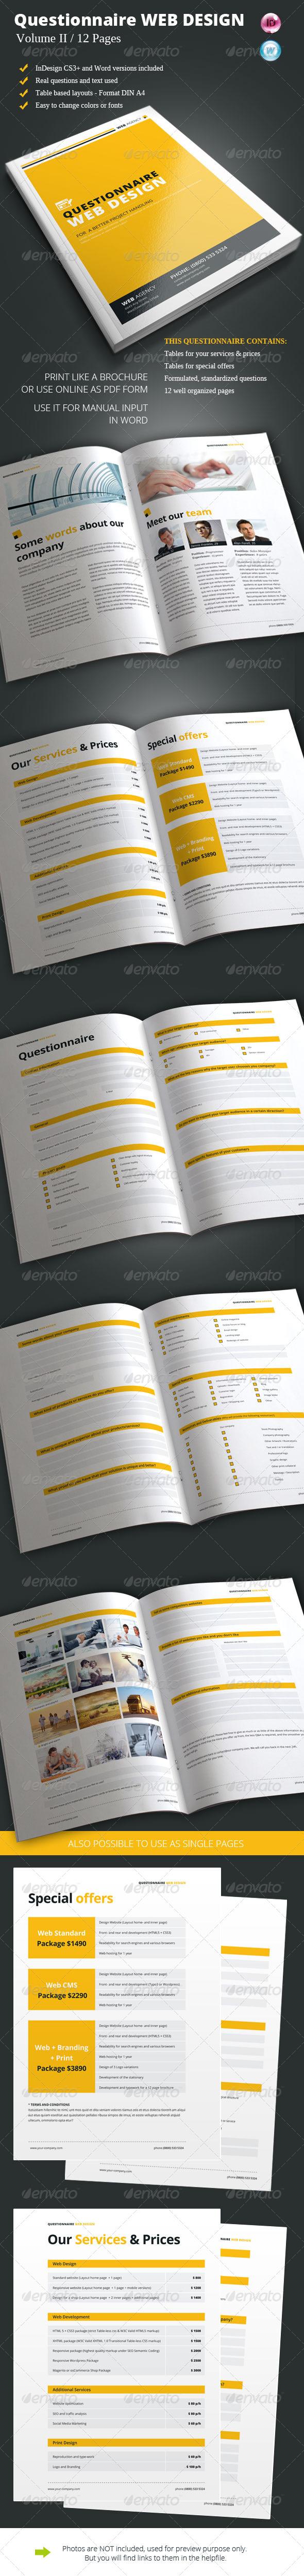 Questionnaire Web Design Vol. II - Informational Brochures